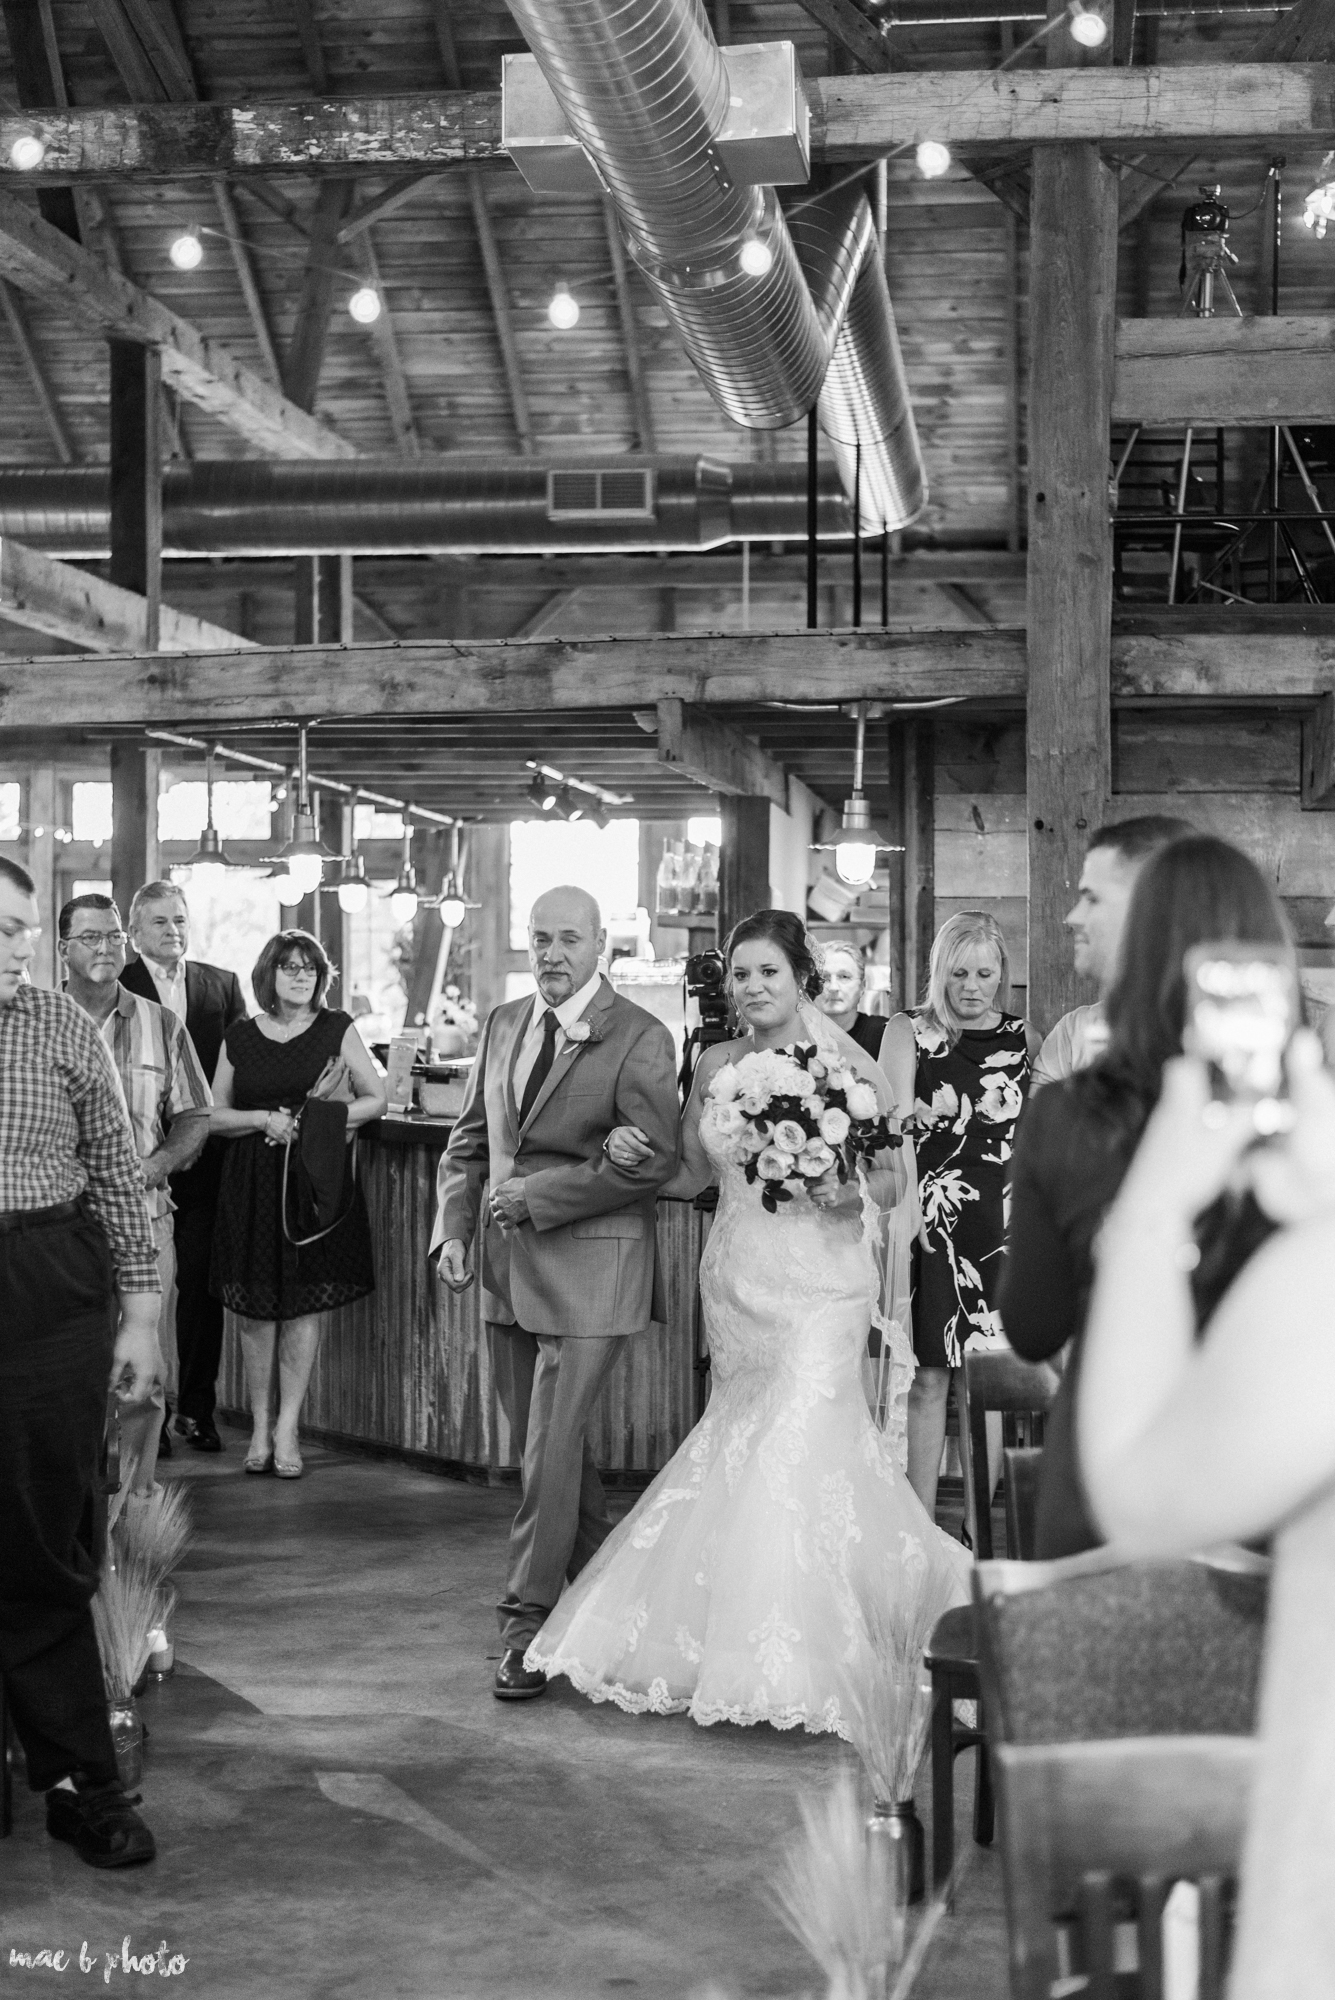 Sarah & Dustin's Rustic Chic Barn Wedding at Hartford Hill Winery in Hartford, Ohio by Mae B Photo-43.jpg